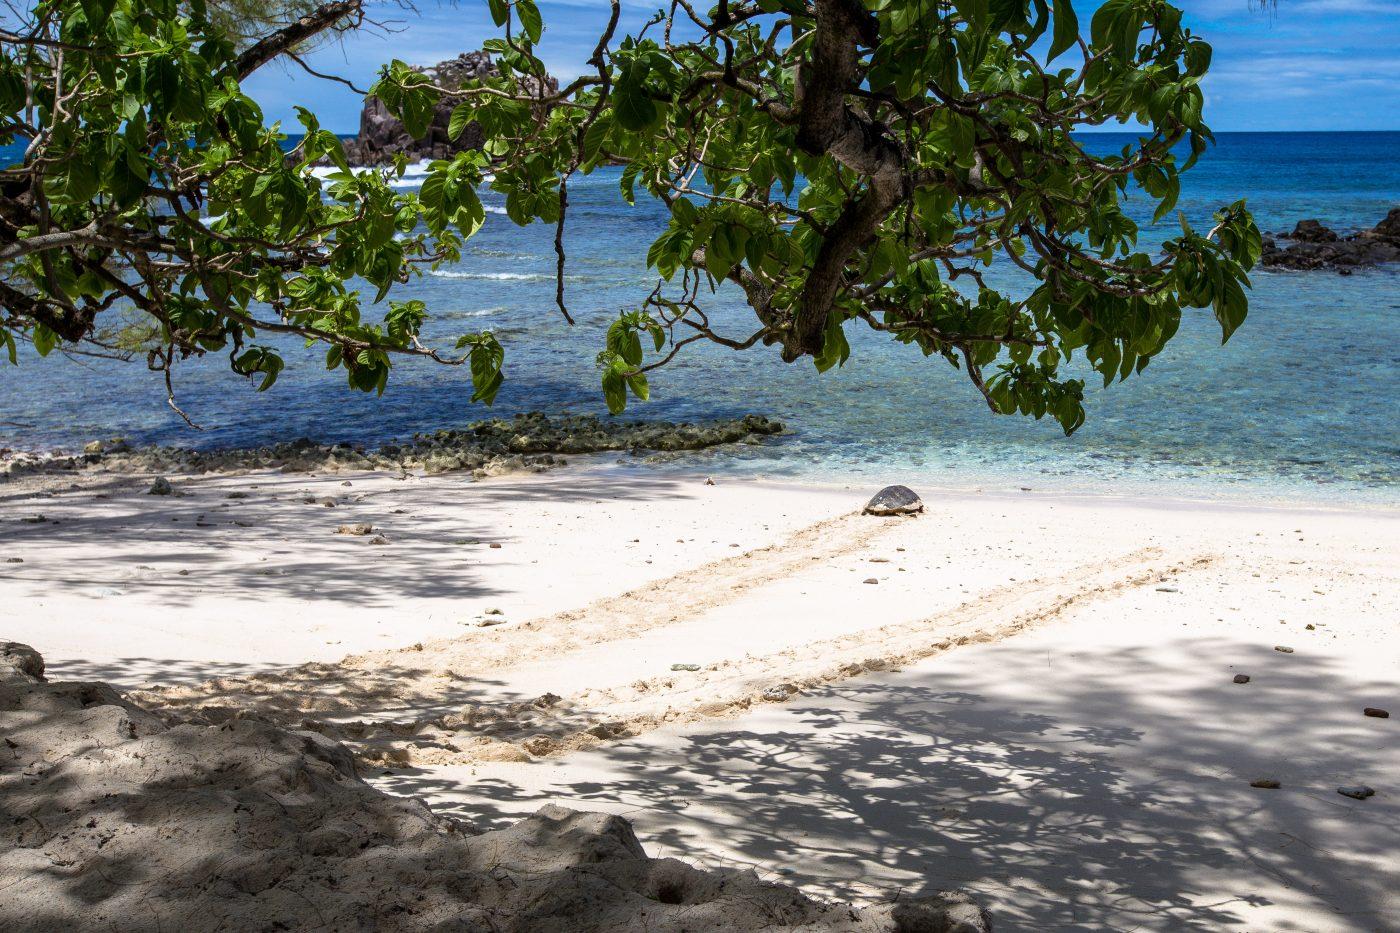 Cousin Island, Seychellen, Ausflüge Seychellen, Ausflüge Praslin, Bootstouren Seychellen, Naturschutz Seychellen